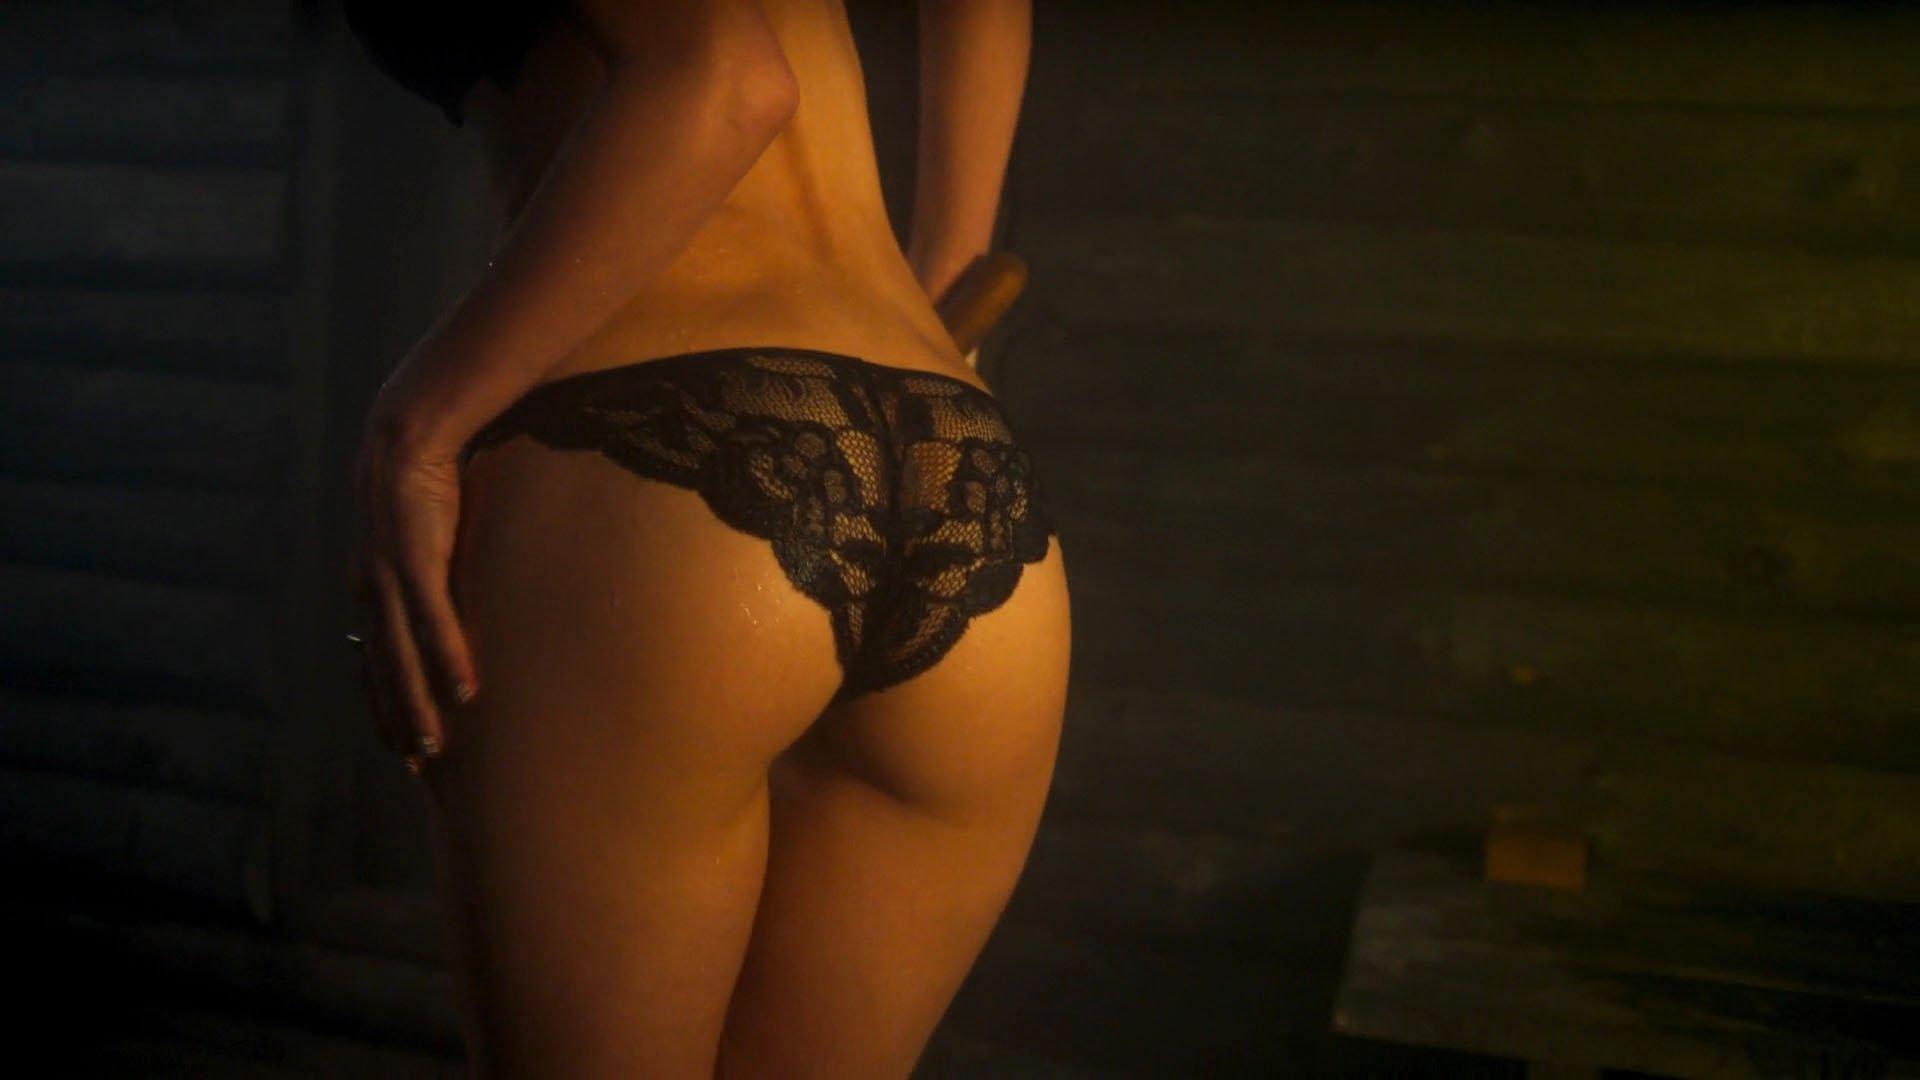 Lyubov aksyonova nude new images